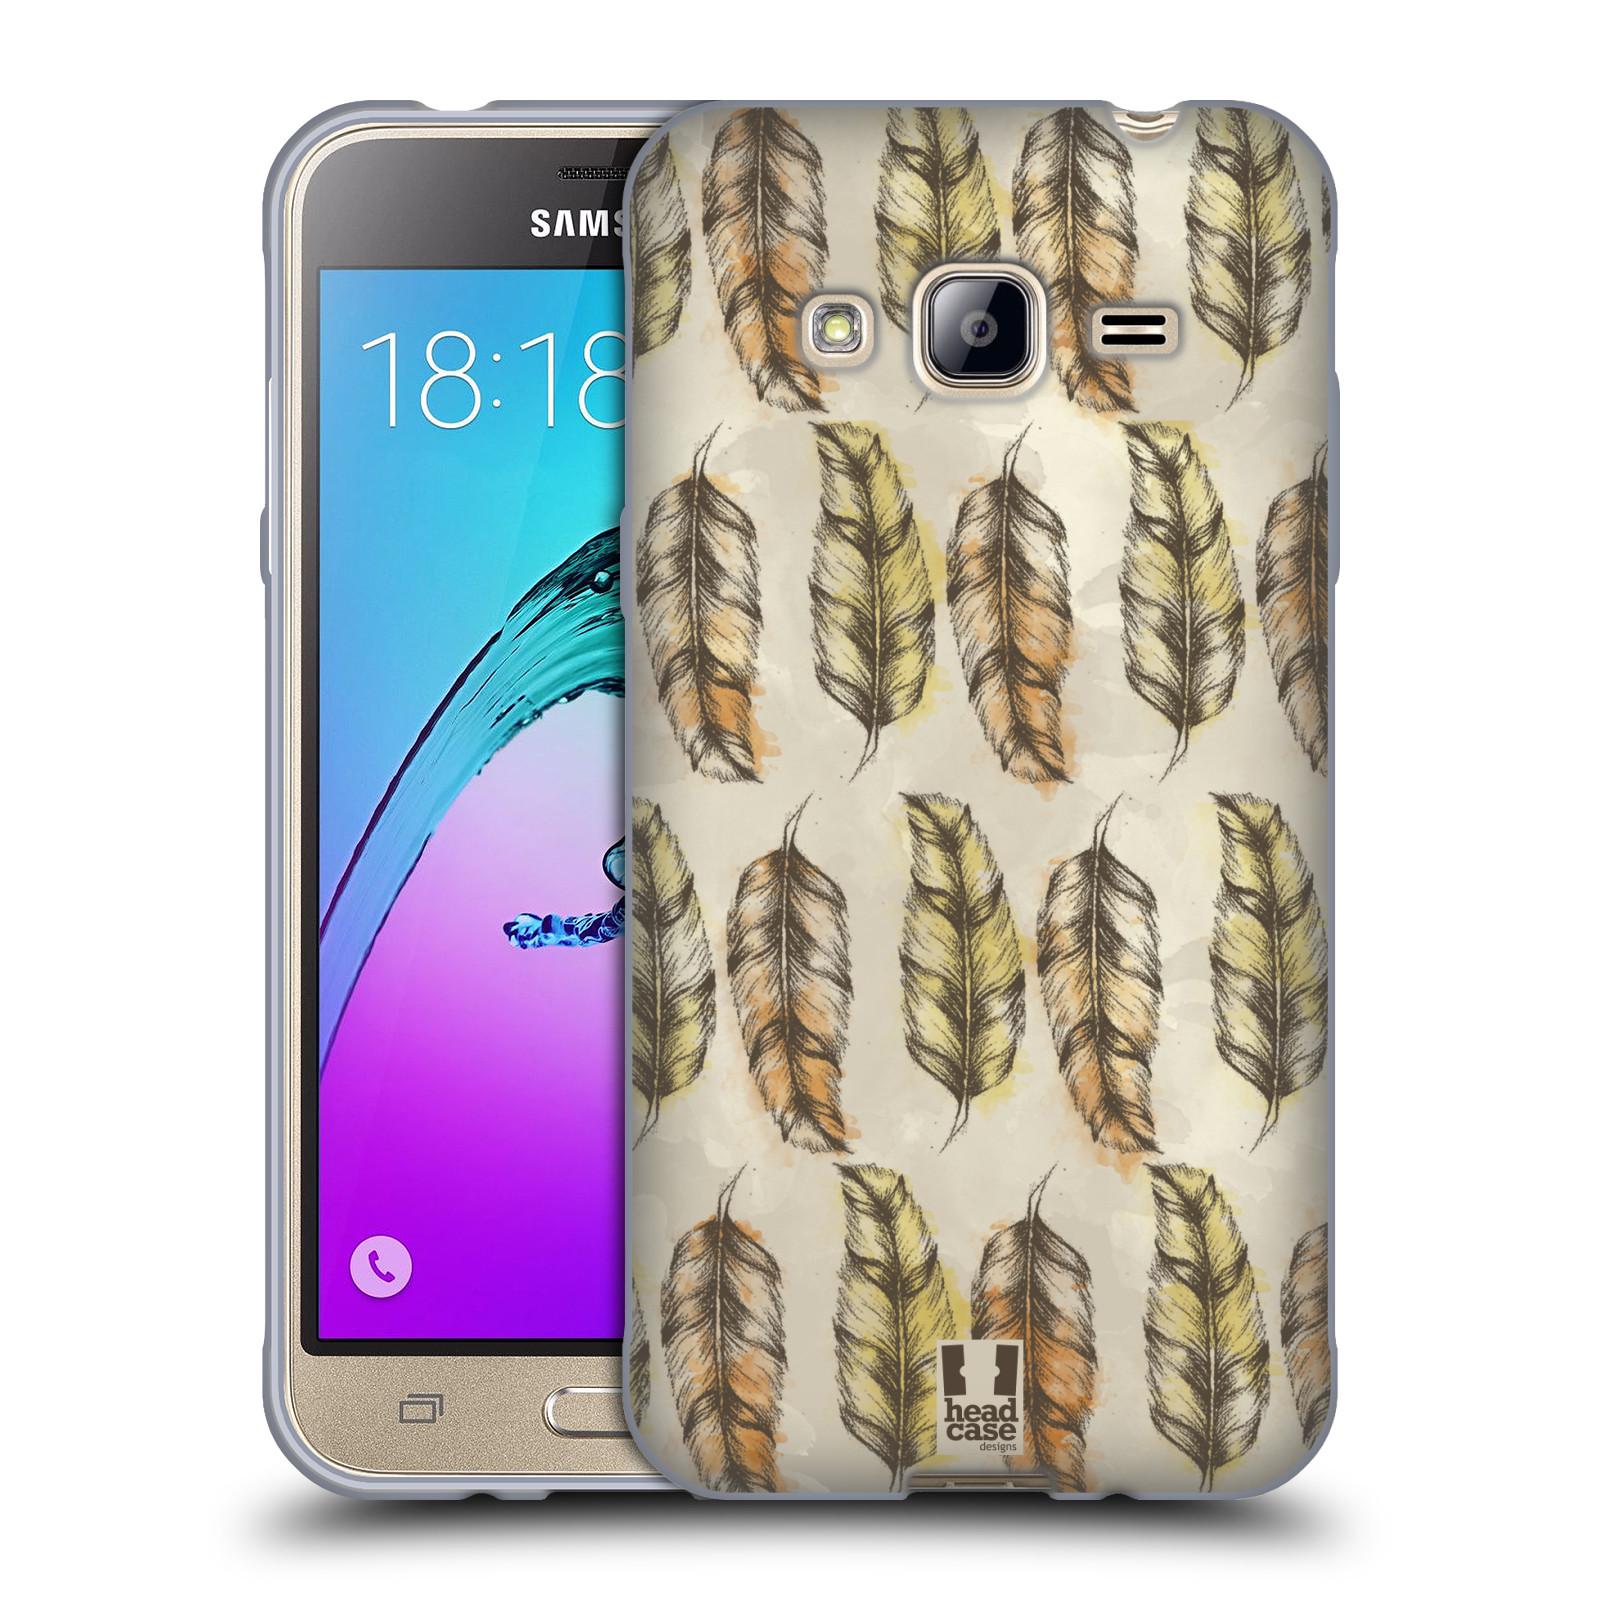 Silikonové pouzdro na mobil Samsung Galaxy J3 (2016) - Head Case - Bohémská pírka (Silikonový kryt či obal na mobilní telefon s motivem Bohemian Soul pro Samsung Galaxy J3 (2016) SM-J320F / Duos - Dual SIM SM-J320DS)